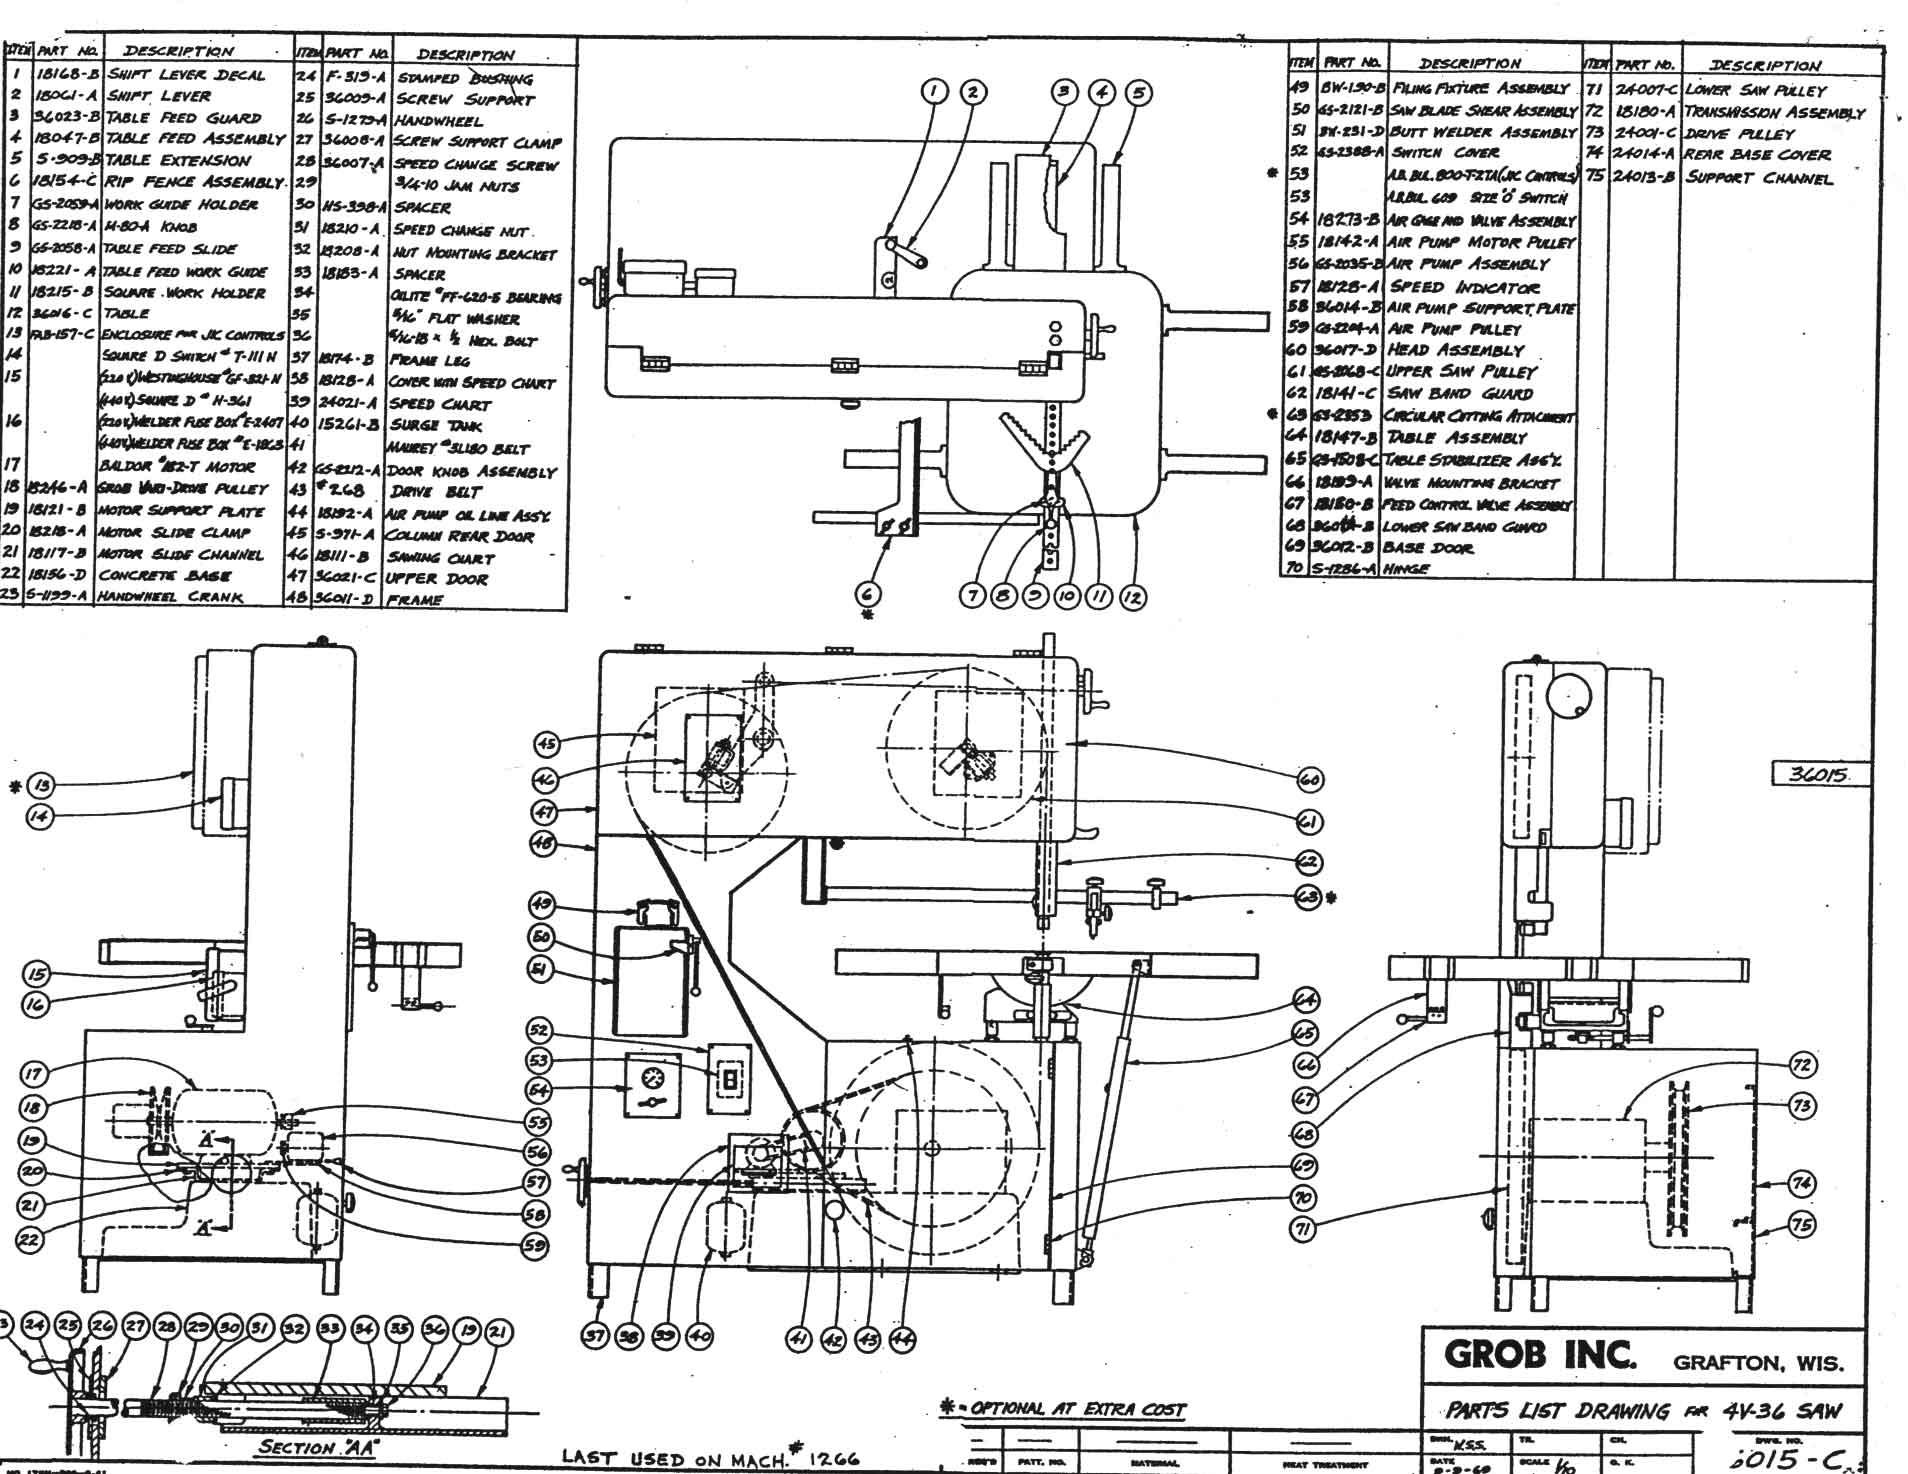 4v36 main assembly parts list